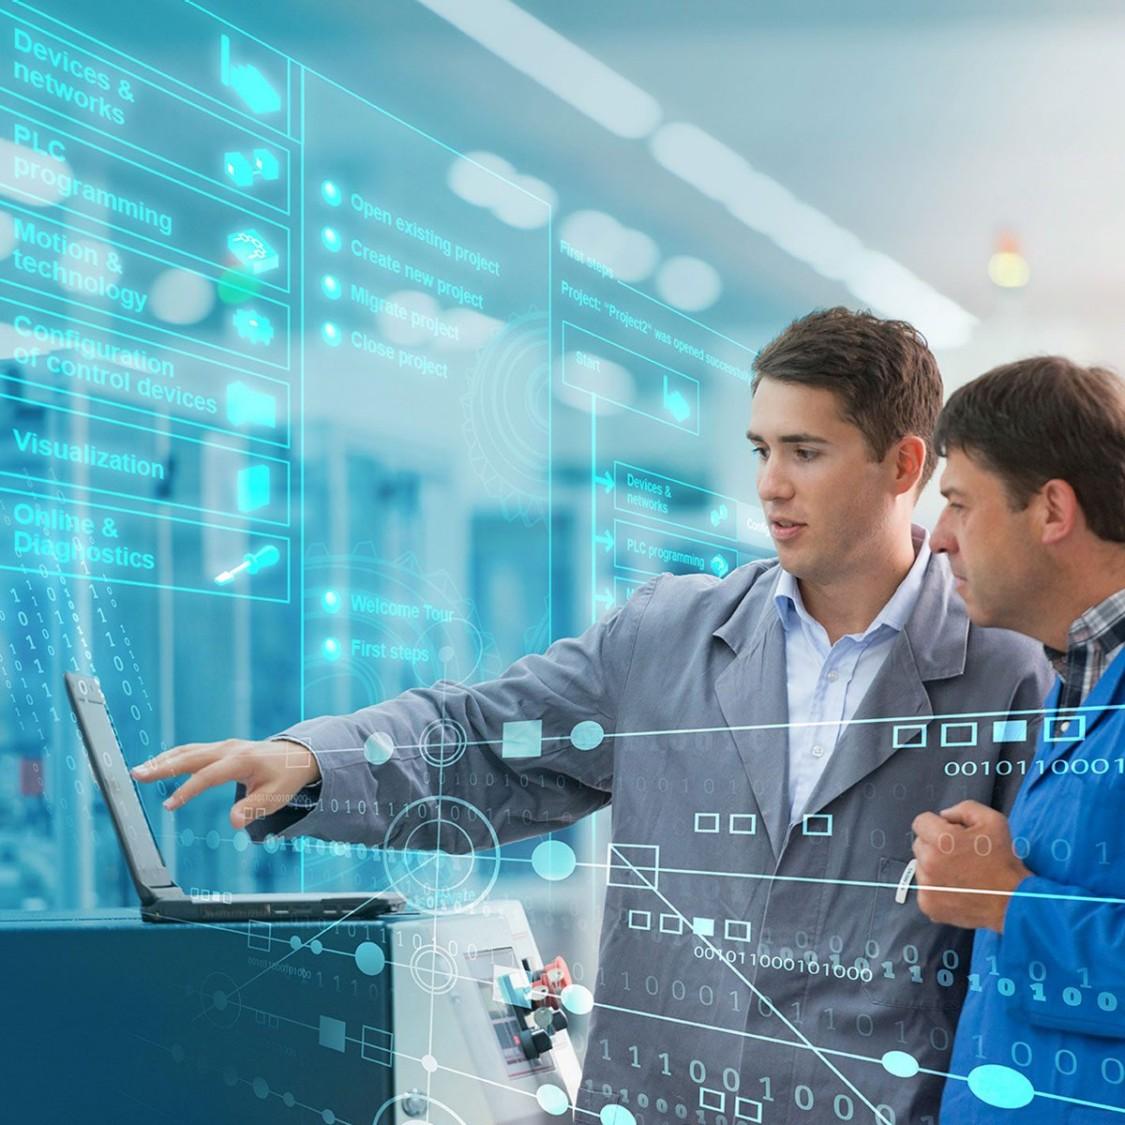 Siemens kundemagasin - Mindsphere, Edge computing og AI.